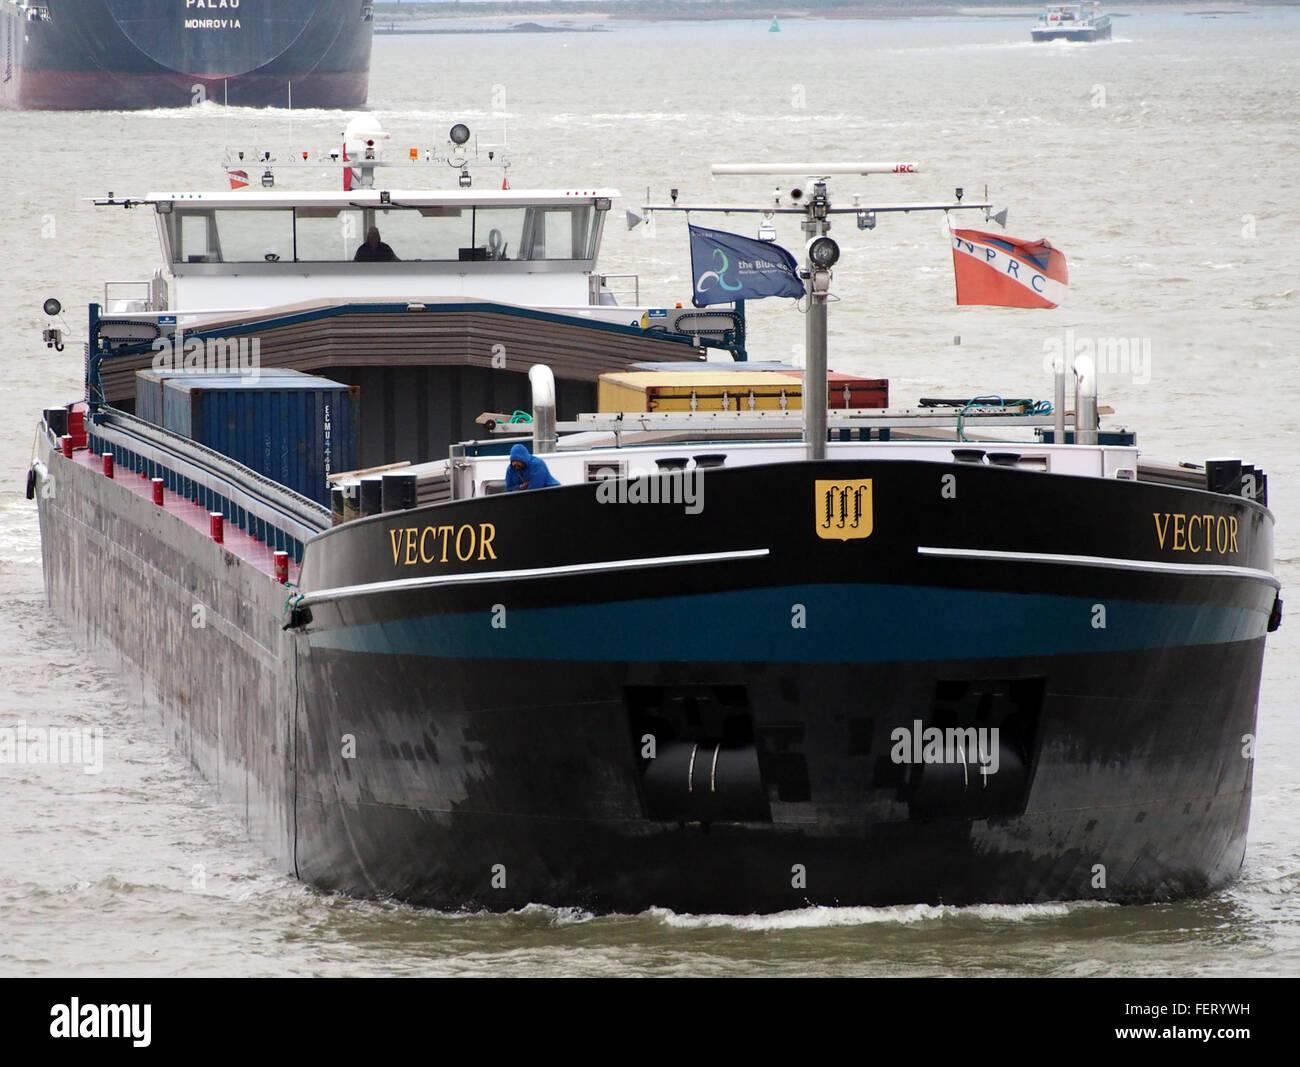 Vector (barco, 2008), ENI 02331015 Puerto de Amberes pic4 Imagen De Stock